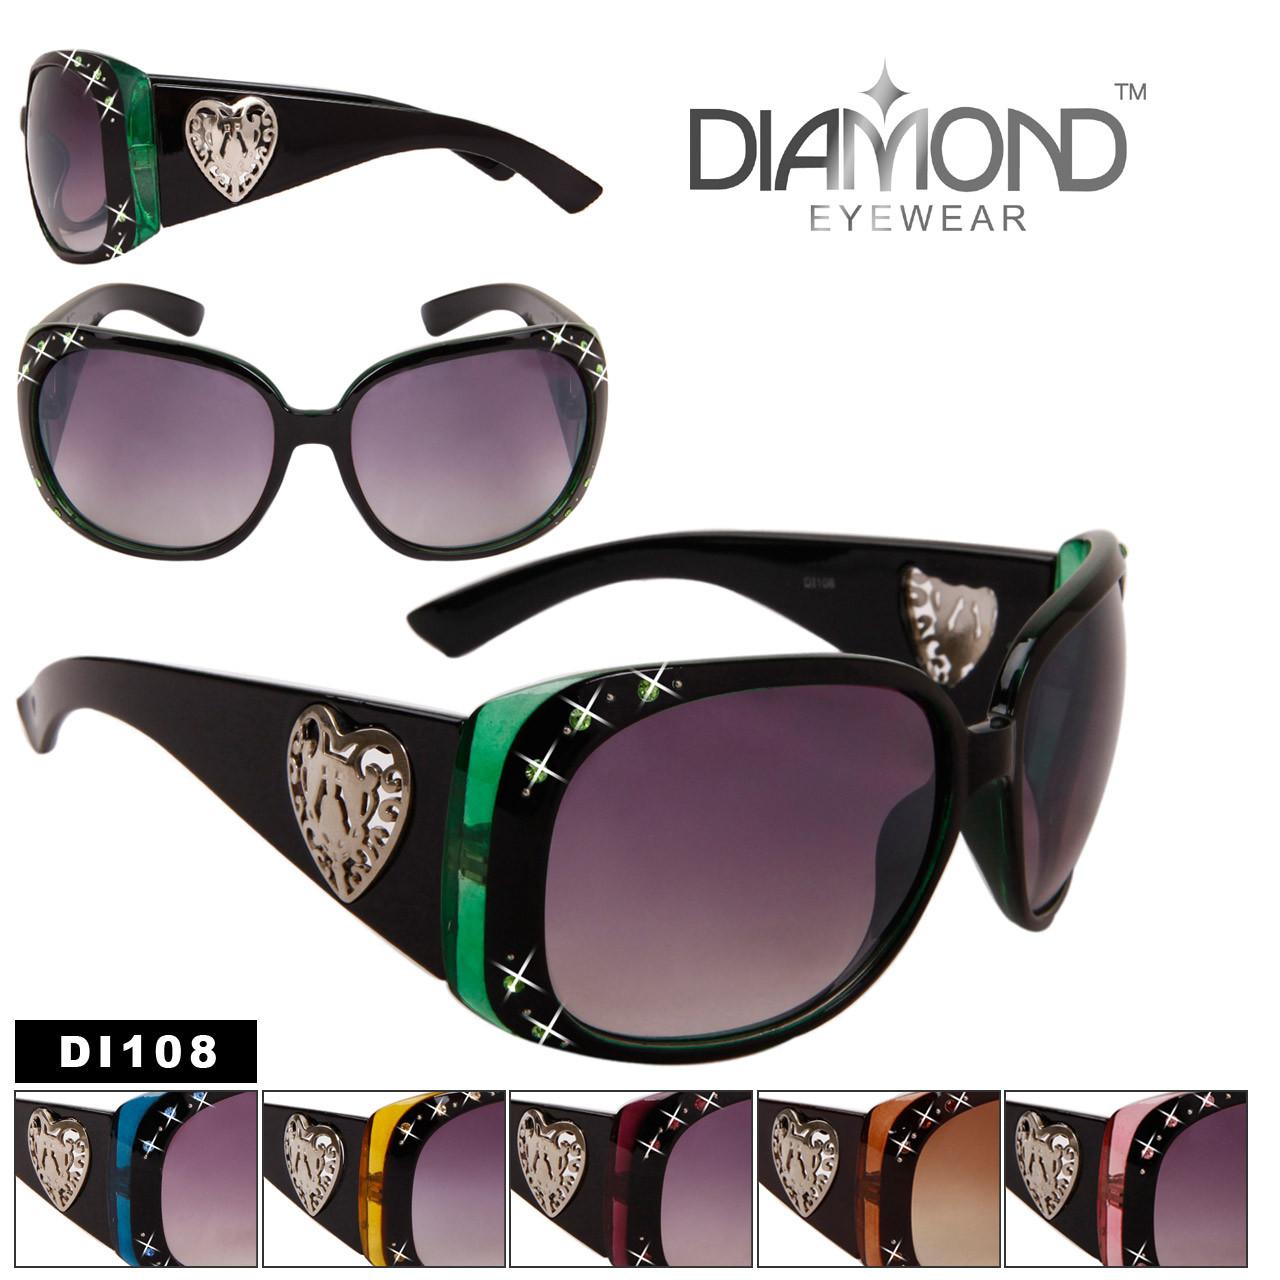 Wholesale Rhinestone Sunglasses DI108 Diamond Eyewear™ (Assorted Colors) (12 pcs.)